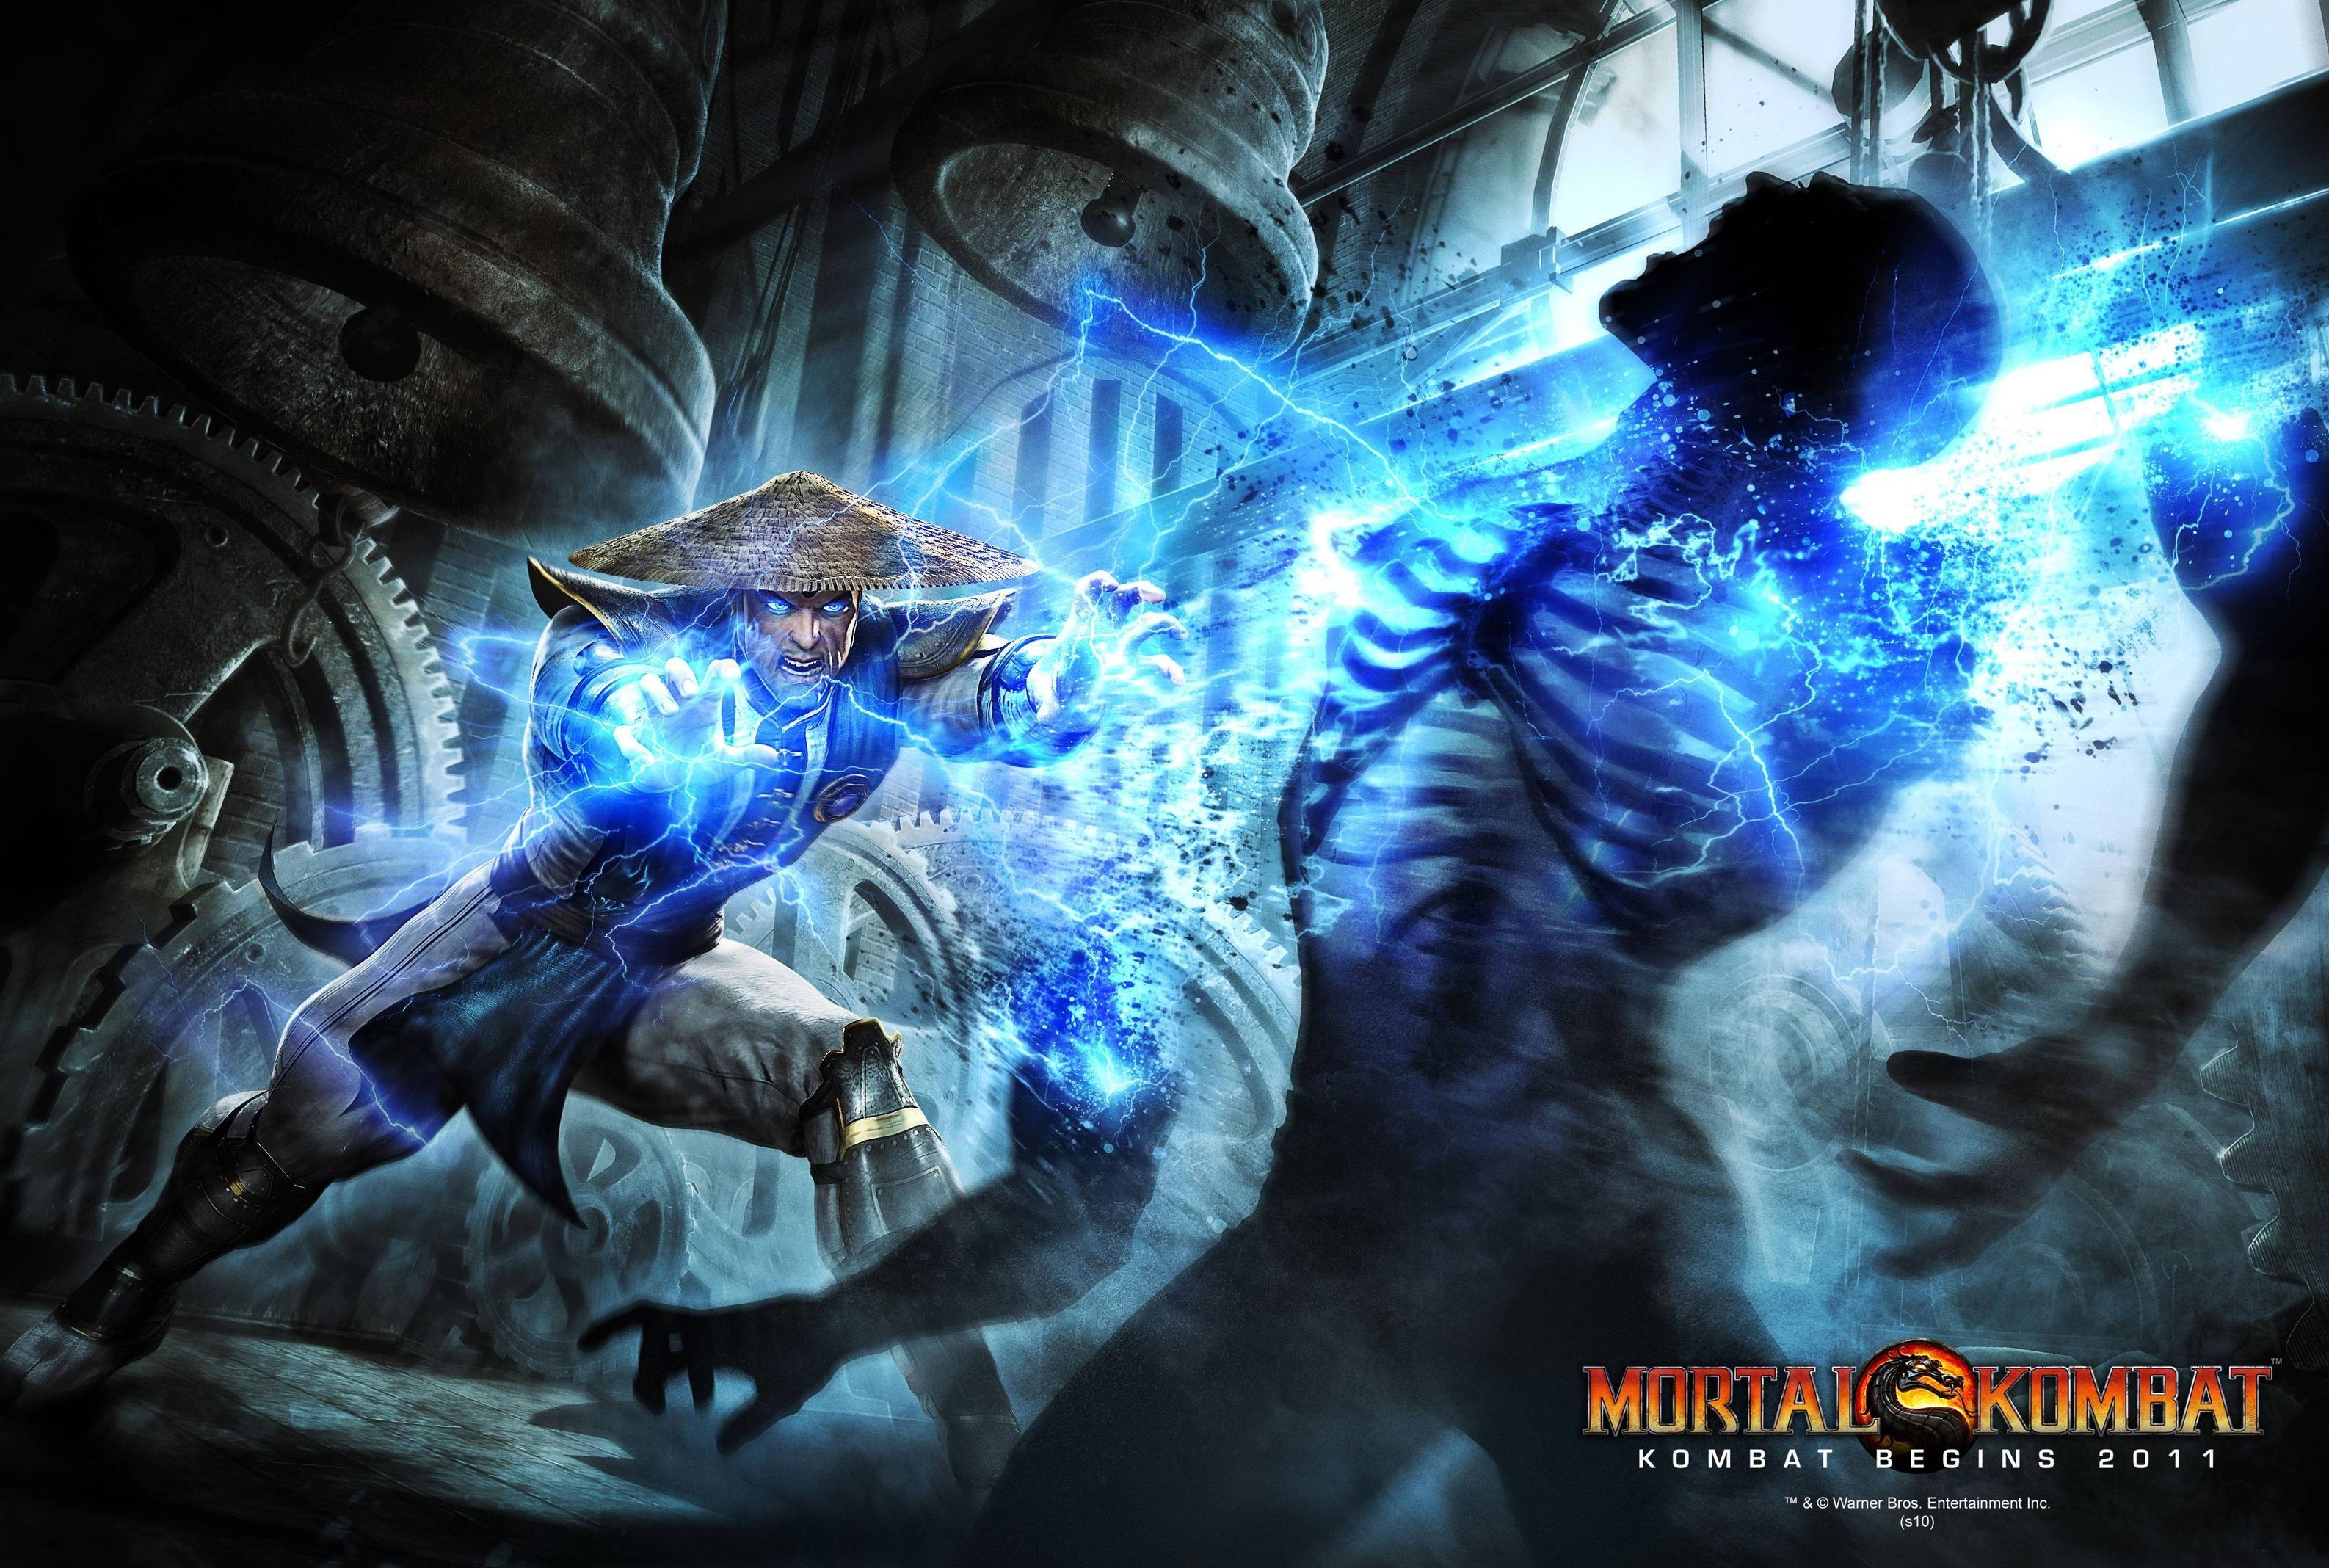 Mortal Kombat 9 Wallpapers Wallpaper Cave Мортал